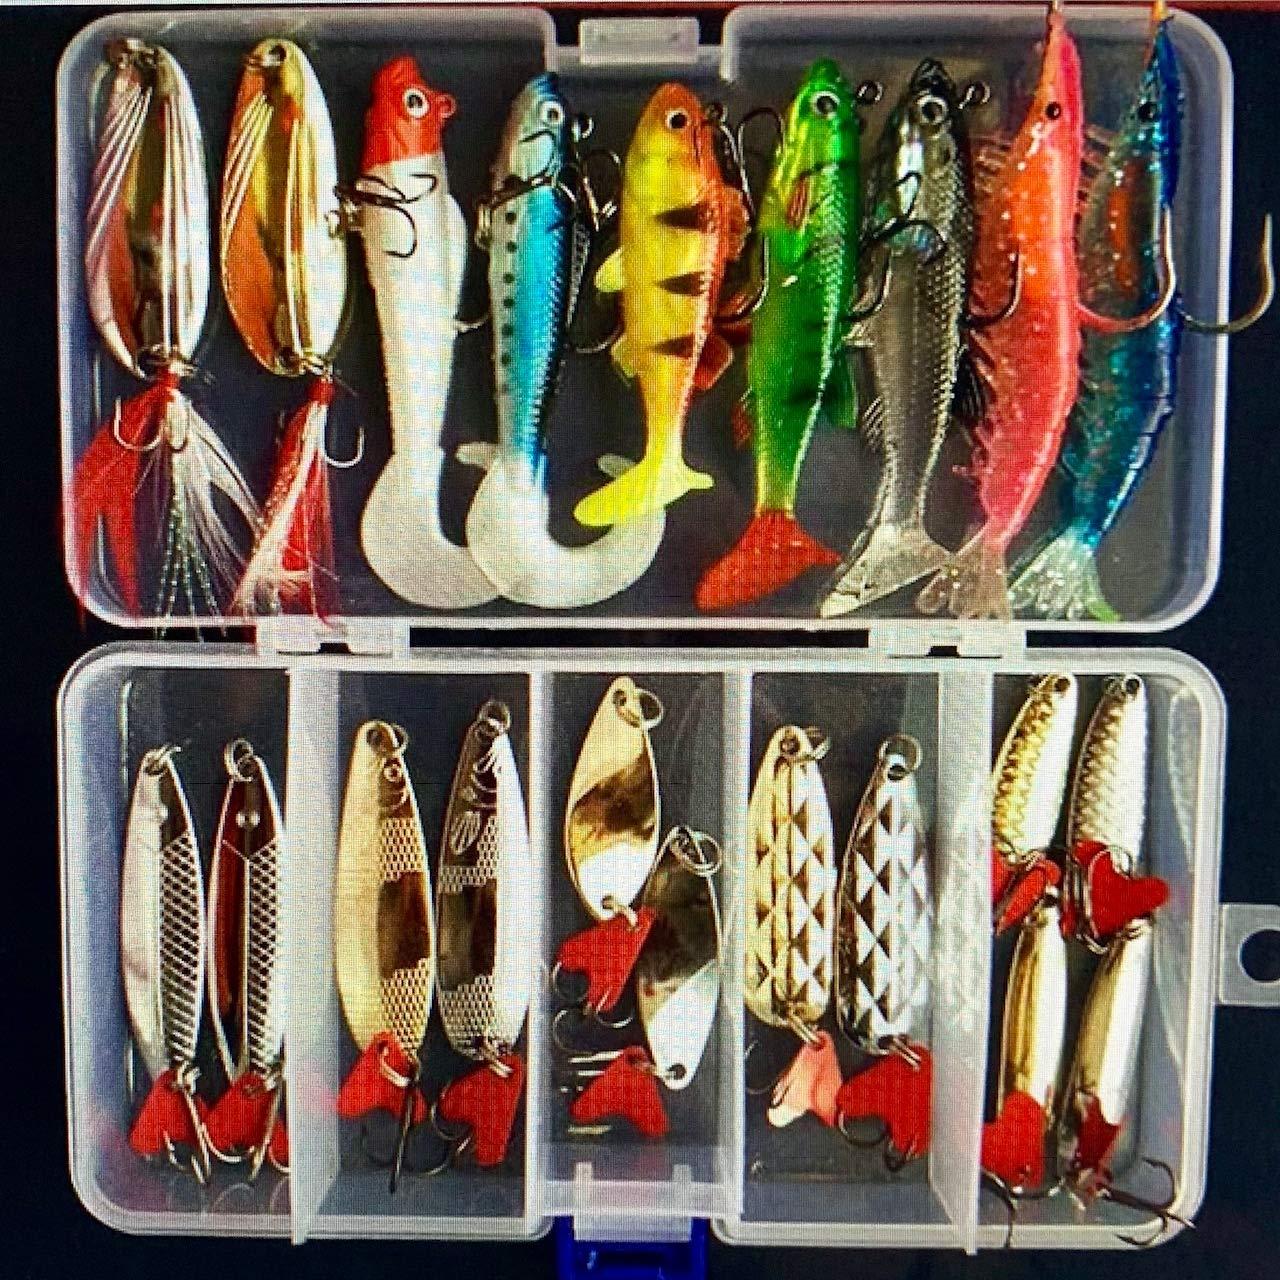 Pesca Peche Hot New Multi Fishing Lure Mixed Colors Plastic Metal Bait Soft Lure Kit Fishing Tackle Wobbler Spoon Artificias